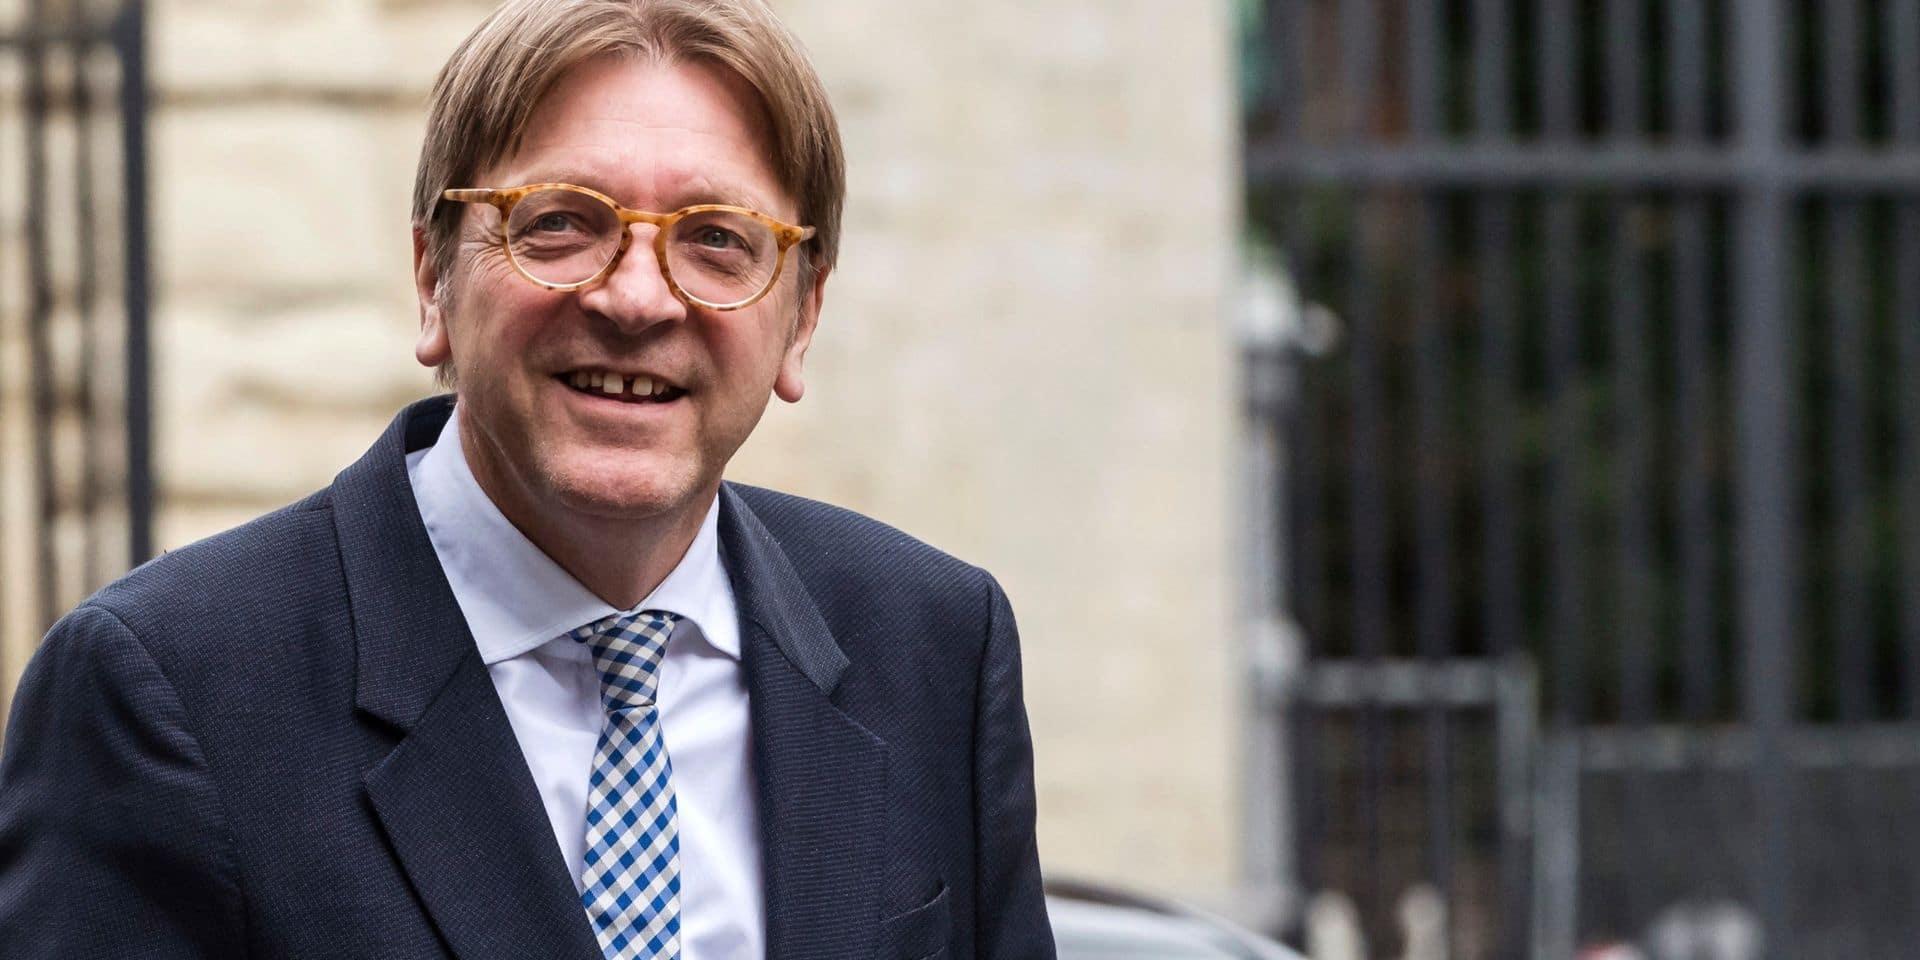 Guy Verhofstadt quitte le conseil communal de Gand